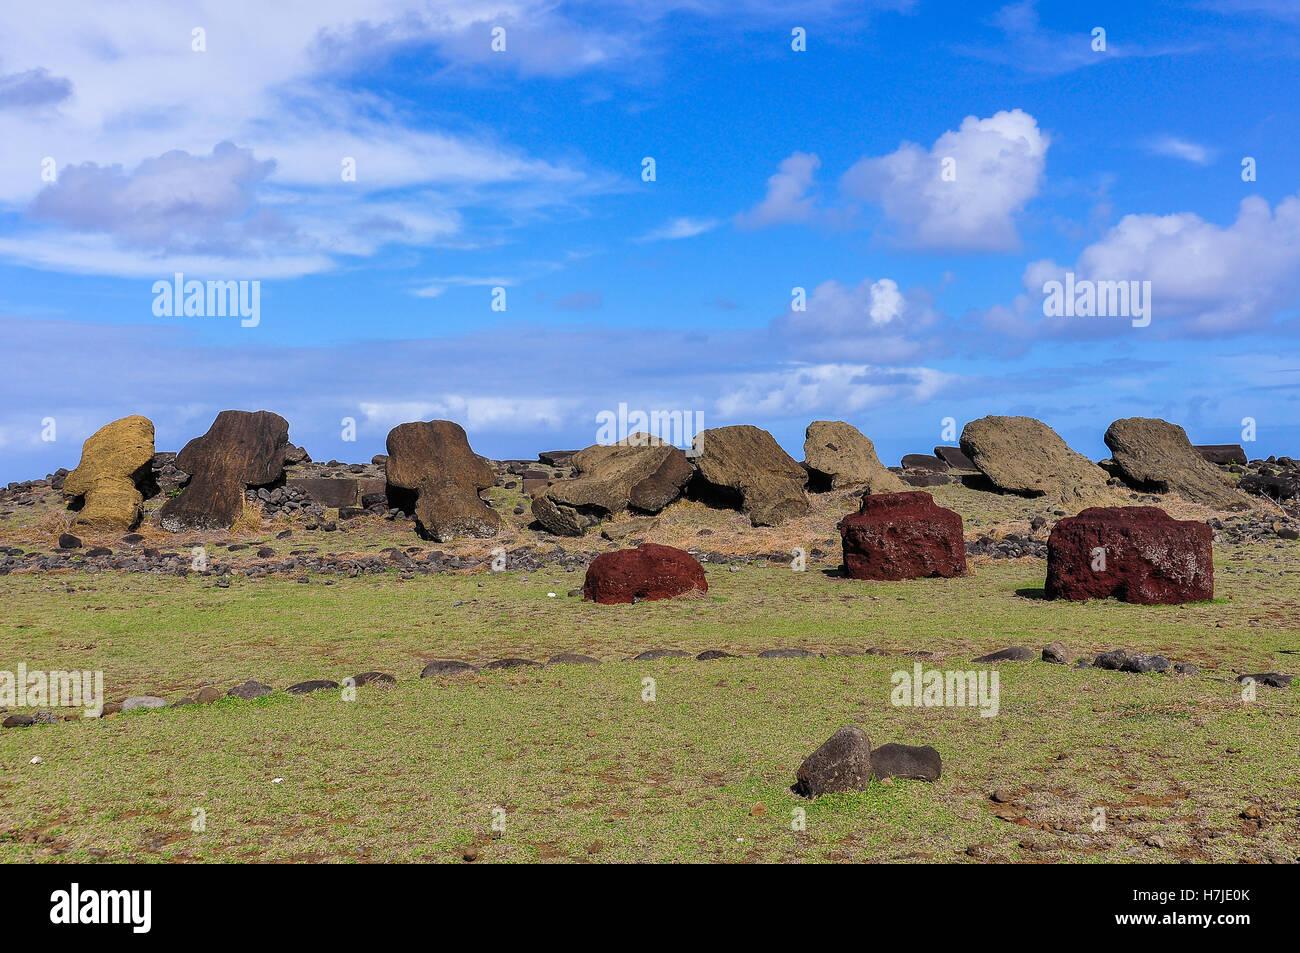 Moai statue ruins in Akahanga site, Easter Island, Chile - Stock Image